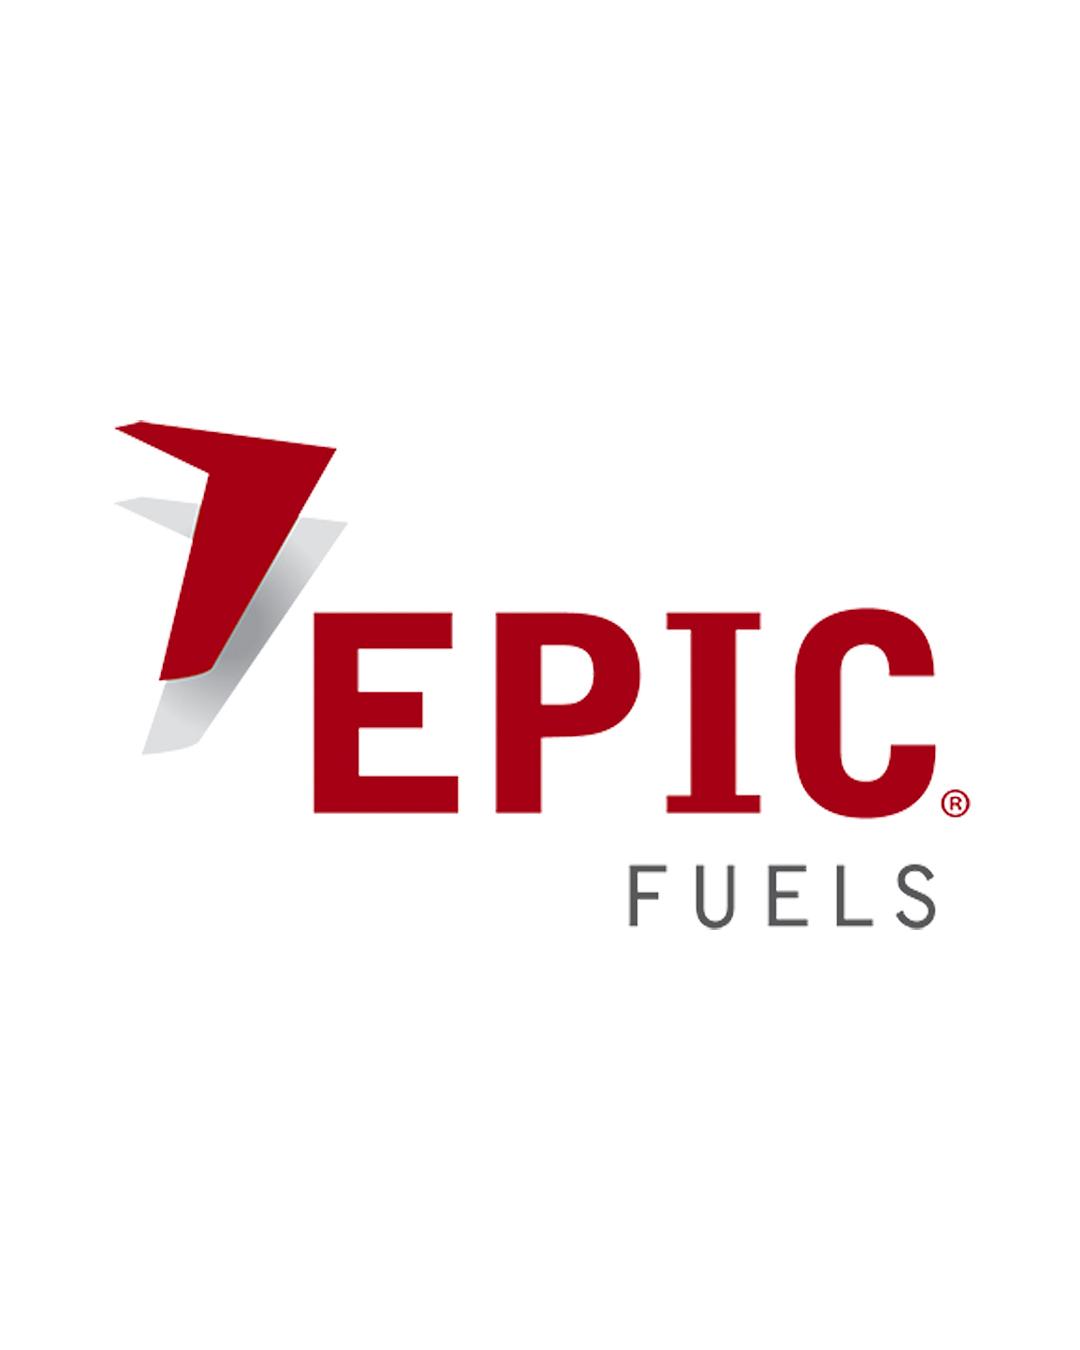 epic_fuels.jpg